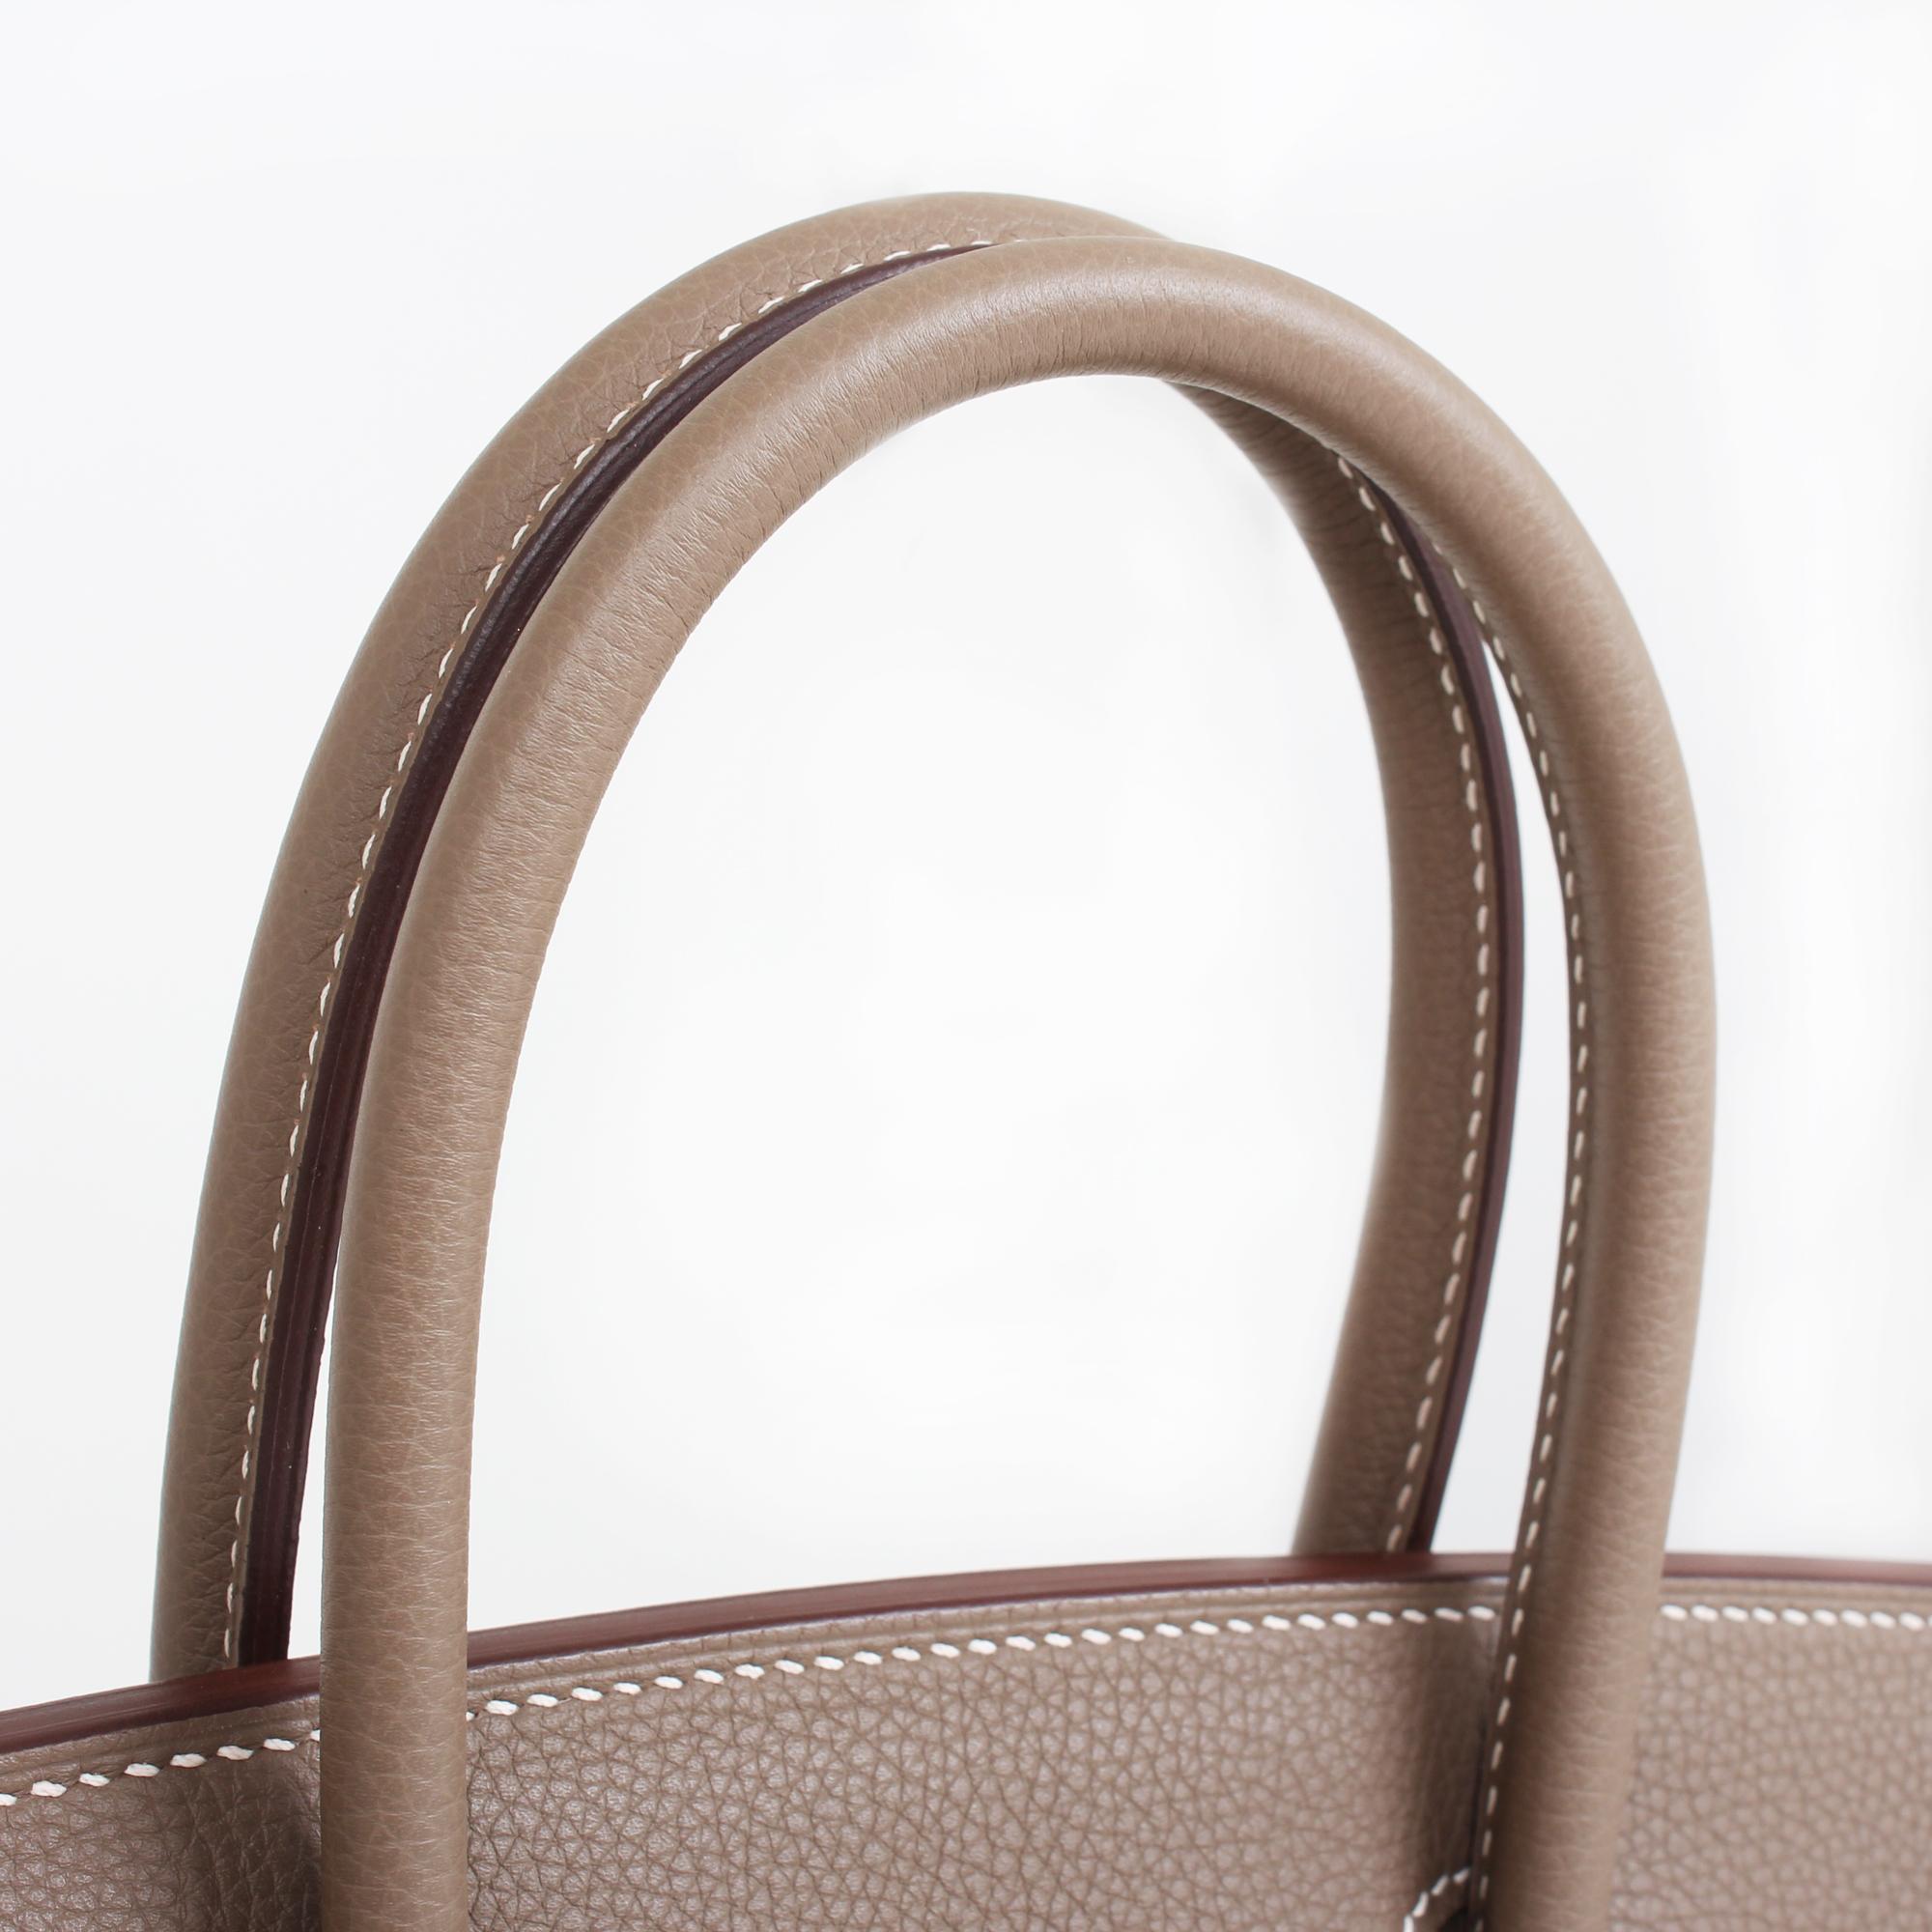 Image of the handle of hermes birkin bag taupe togo